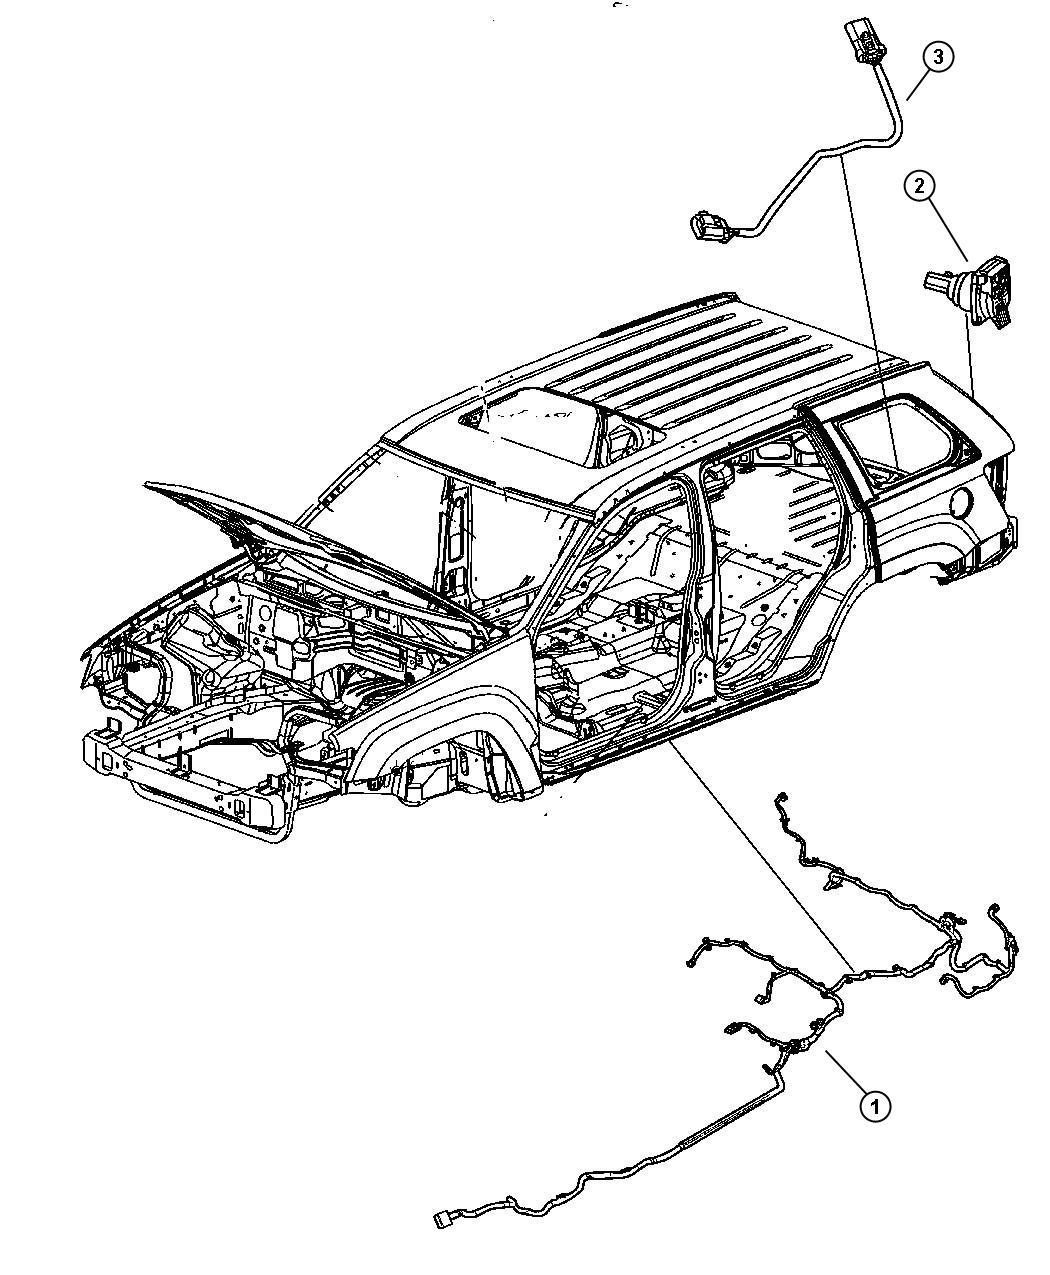 2008 Jeep Grand Cherokee Wiring. Underbody ...